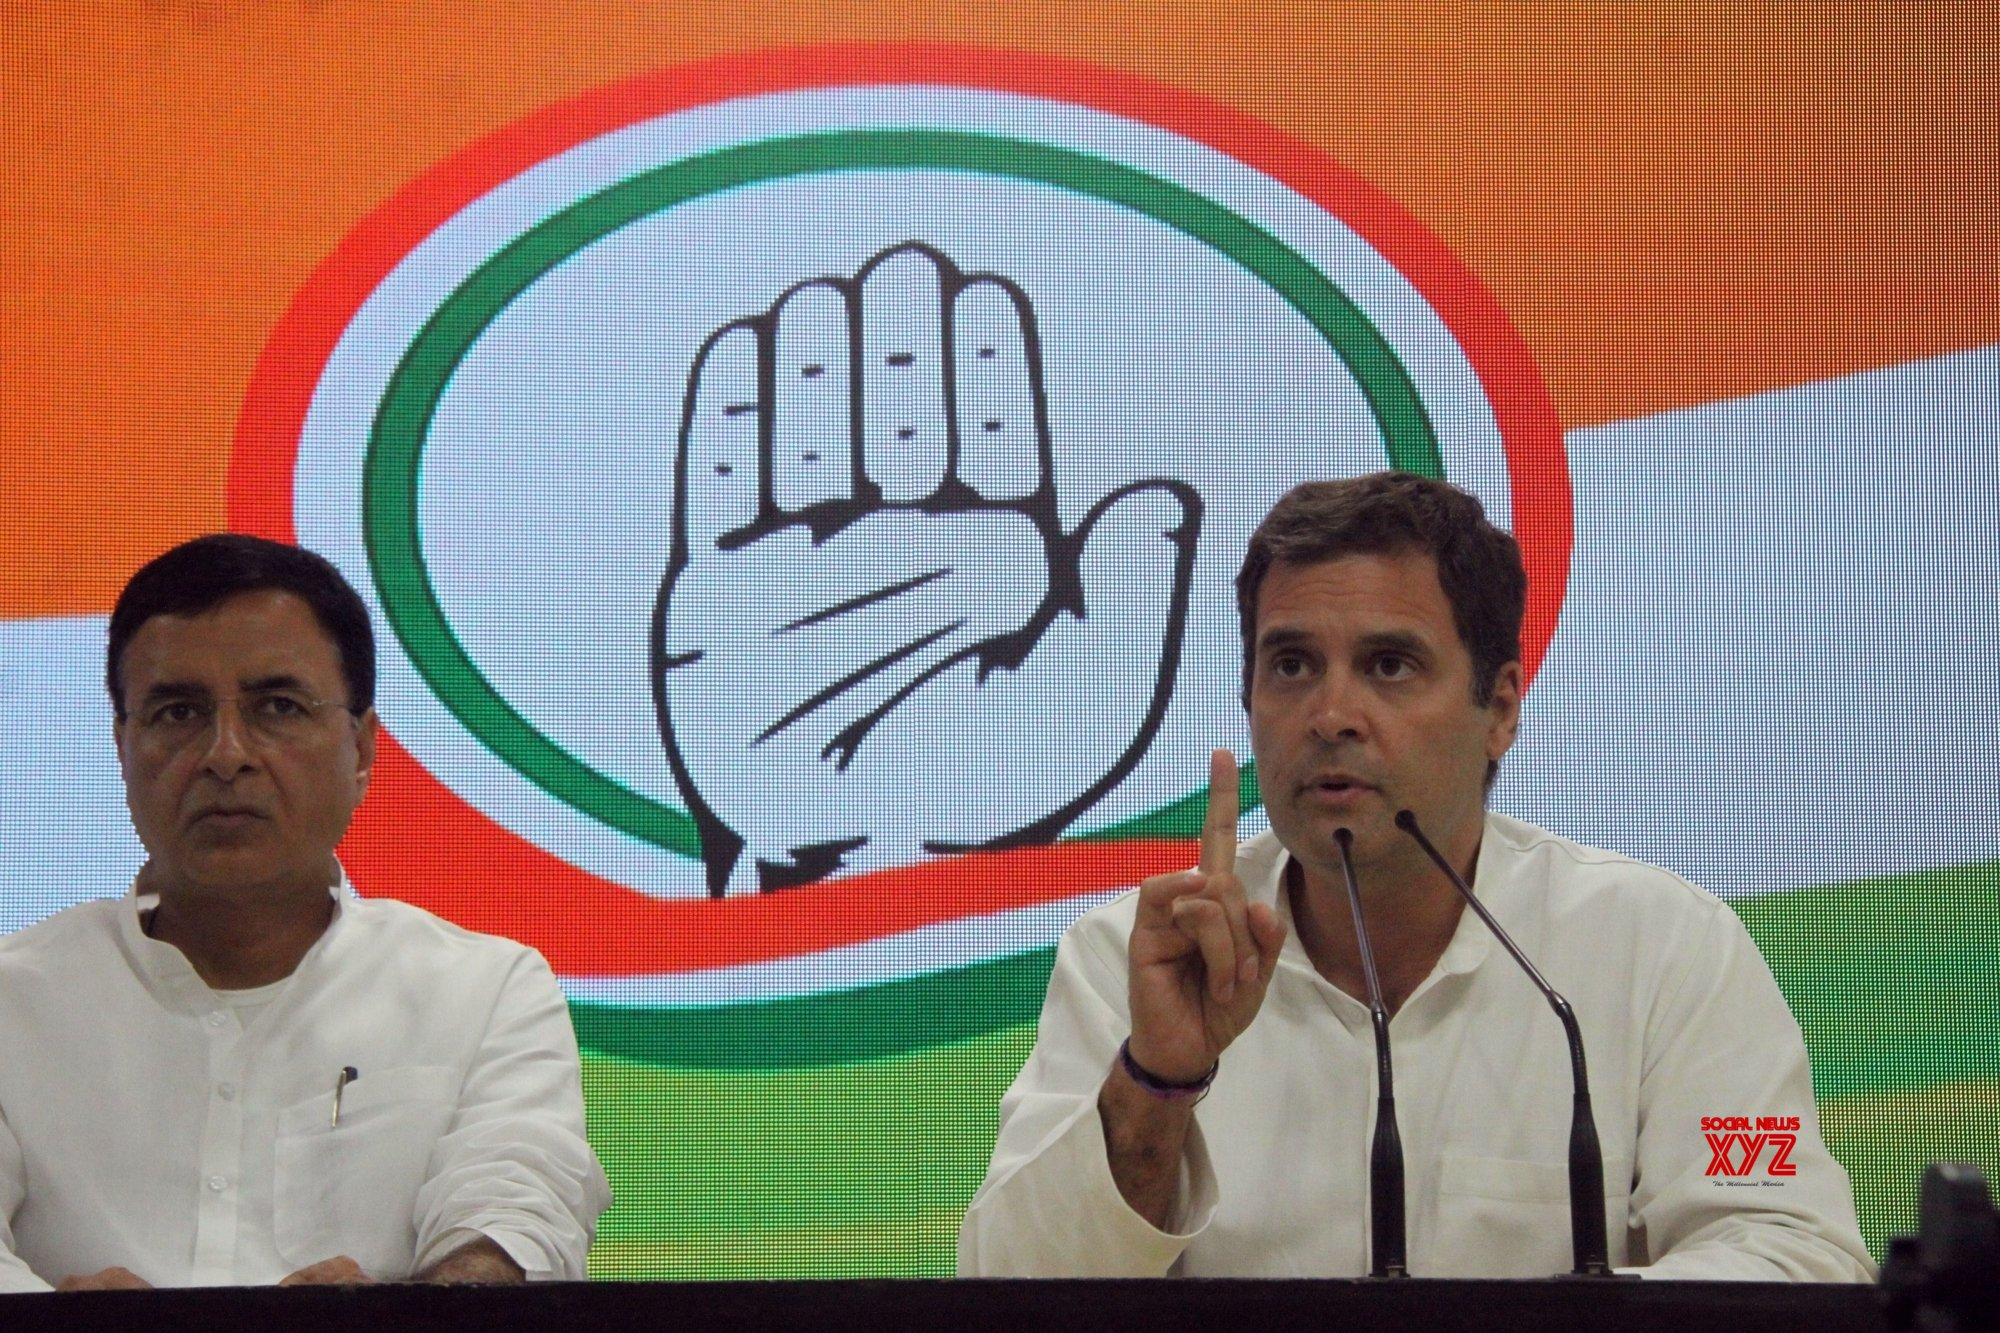 New Delhi: Rahul Gandhi's press conference (Batch - 3) #Gallery